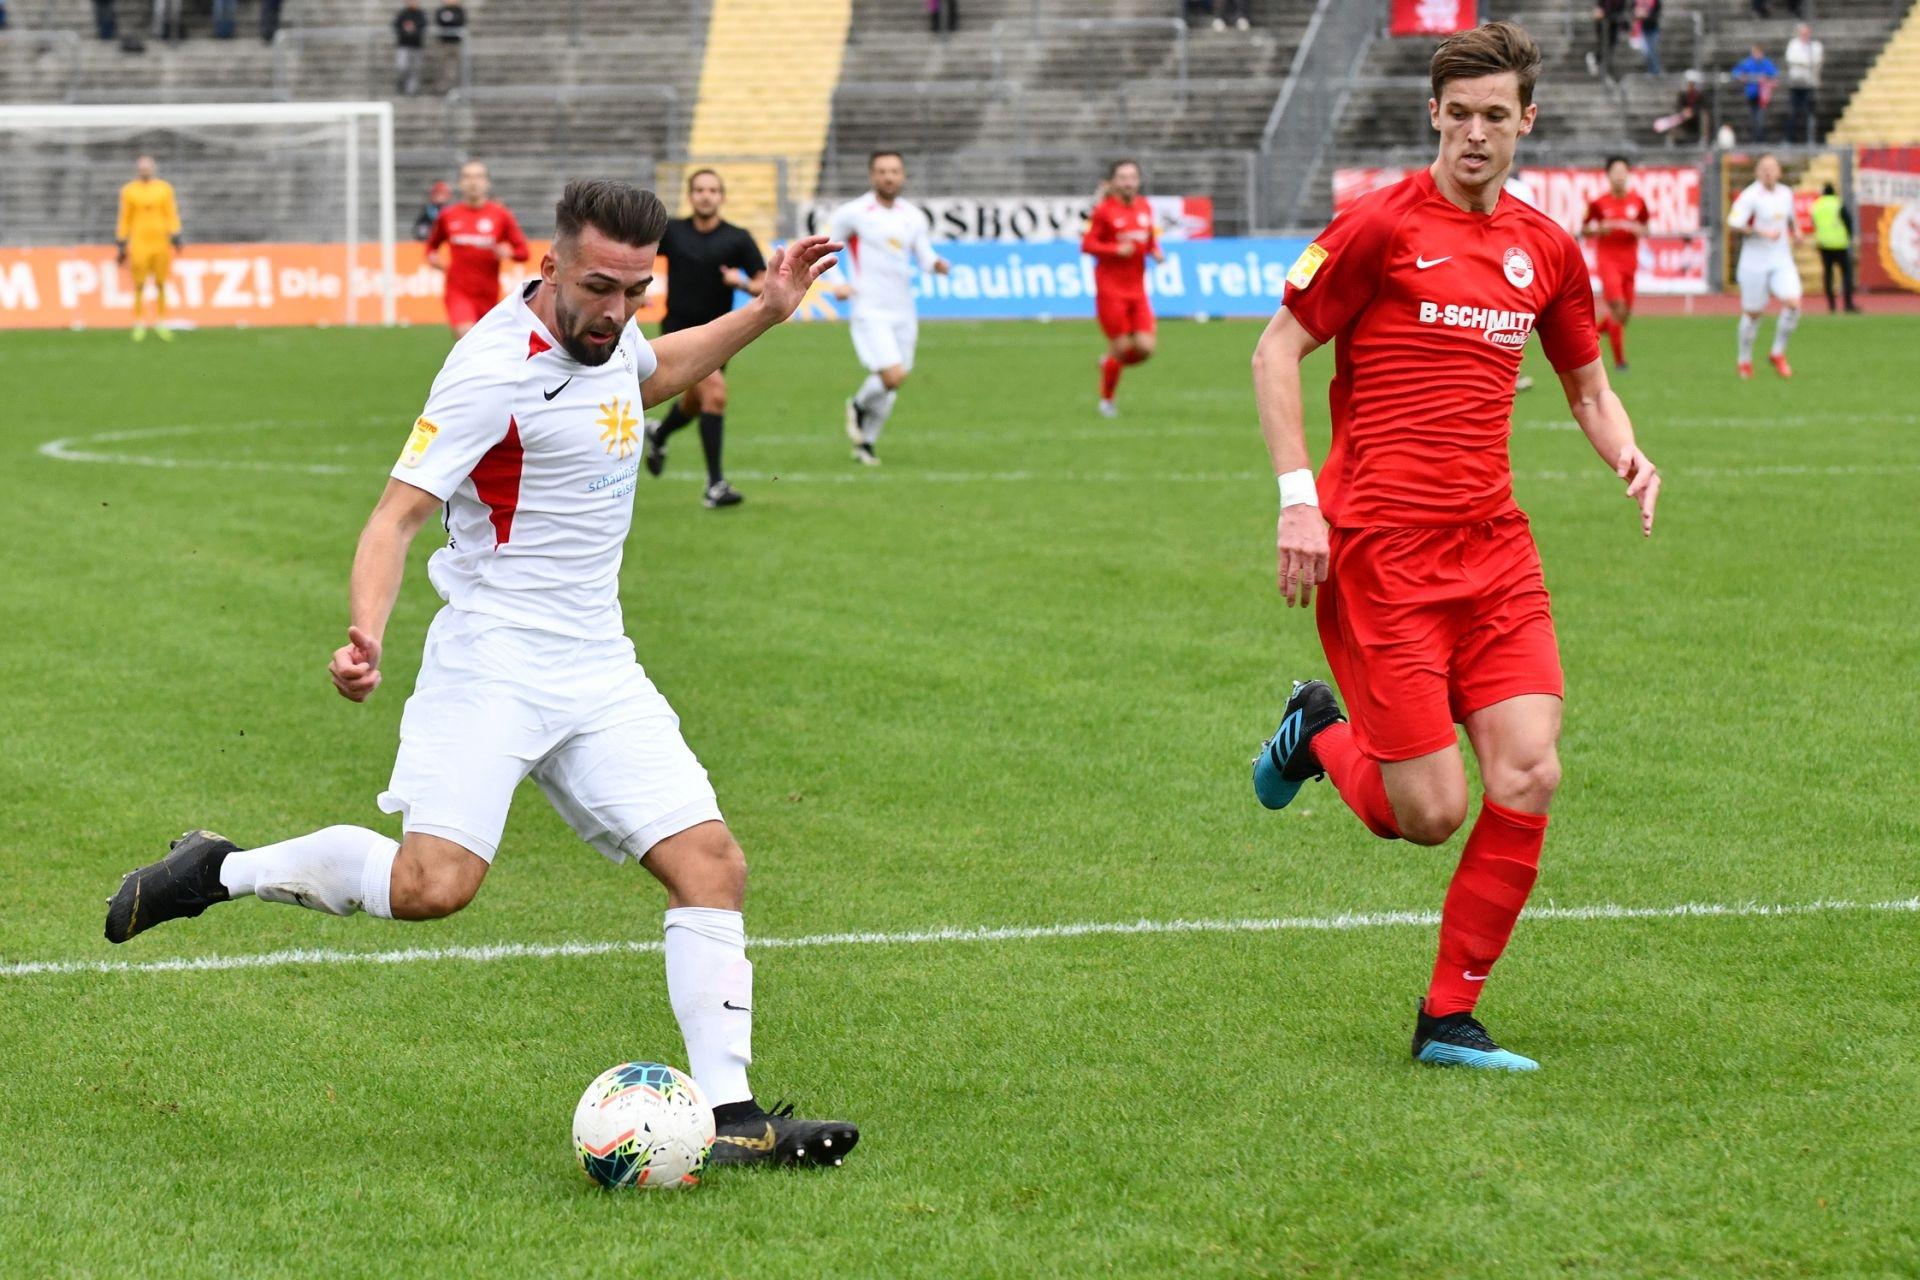 KSV Hessen Kassel, Rot-Weiss Walldorf, Endstand 4:0, Marco Dawid (KSV Hessen Kassel)